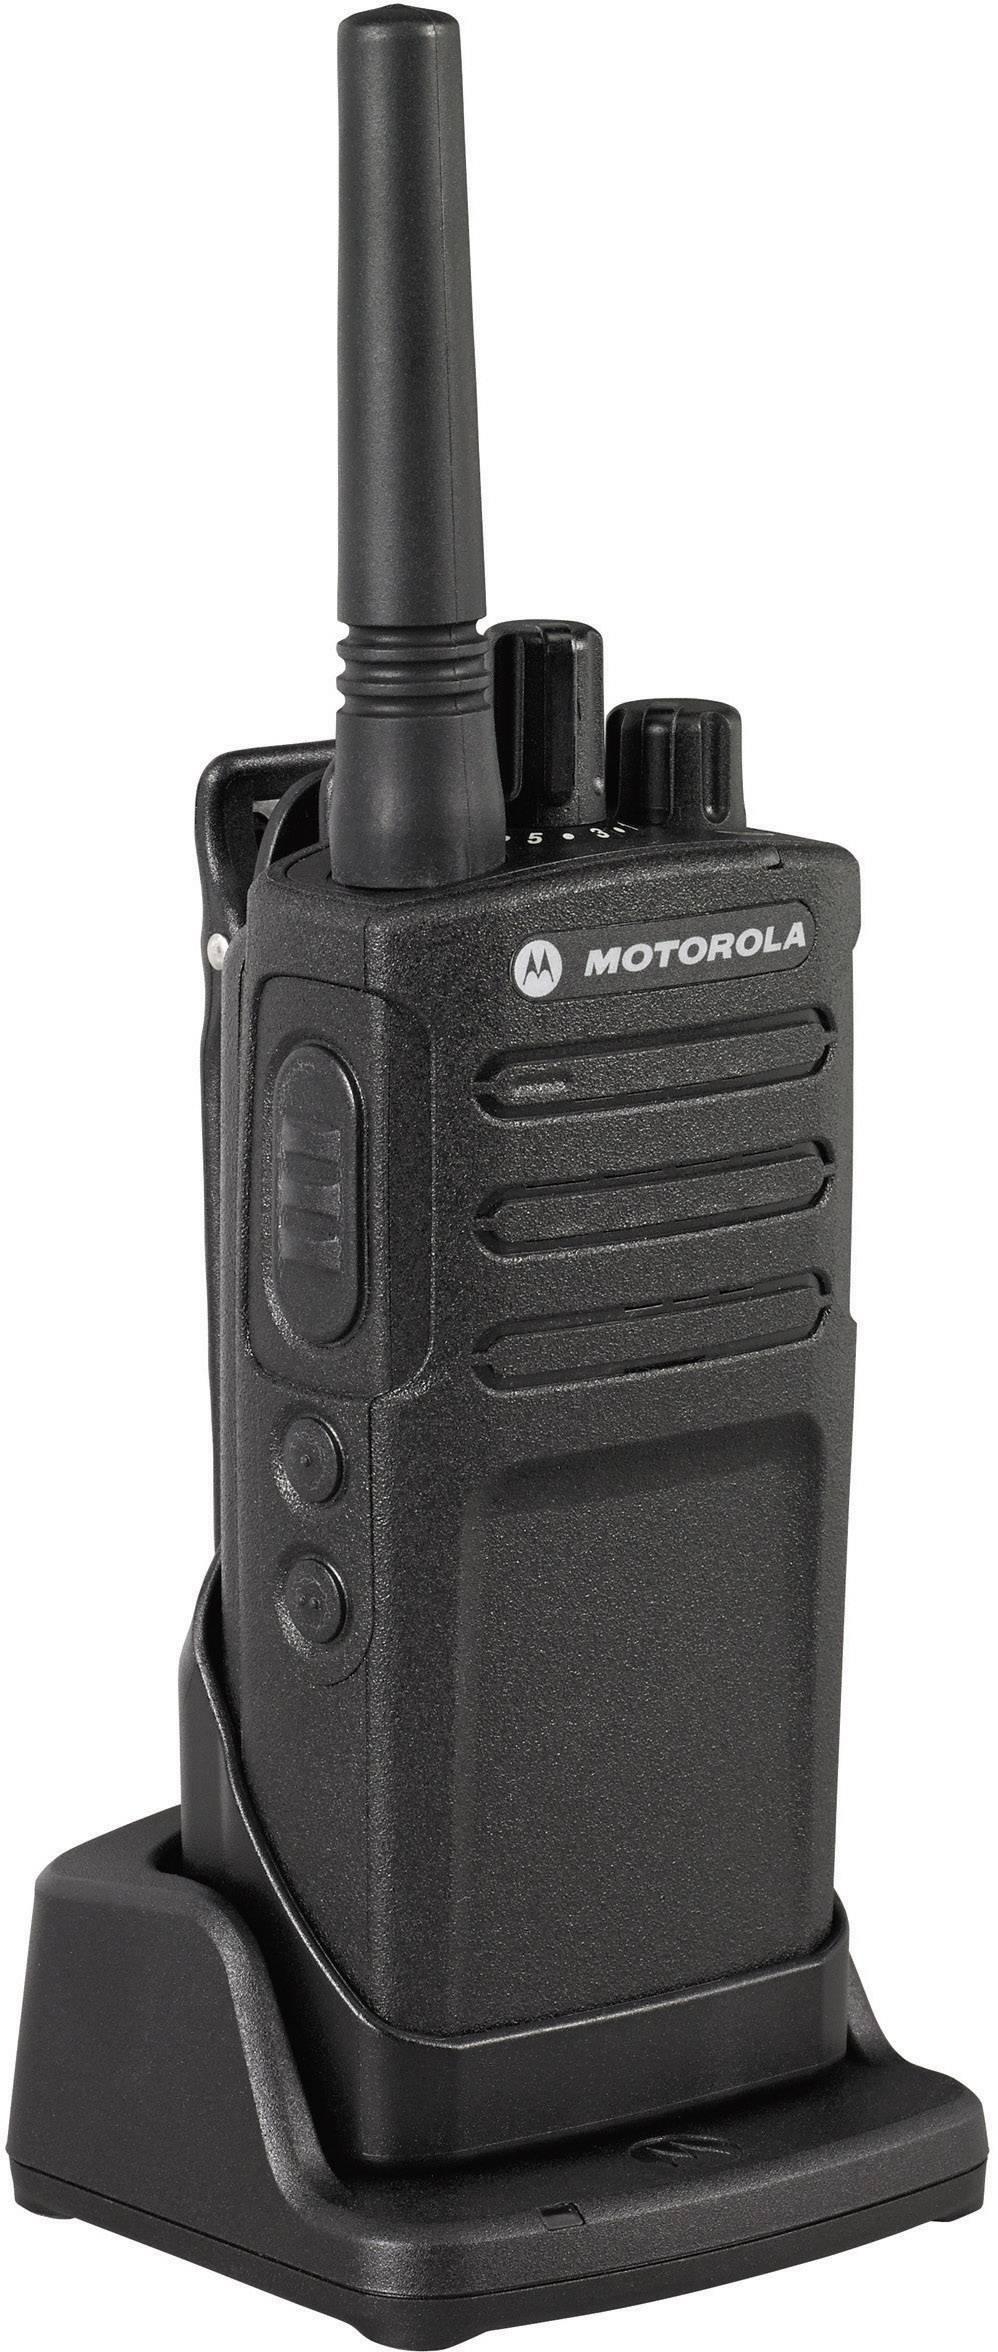 PMR rádiostanica Motorola XT 420